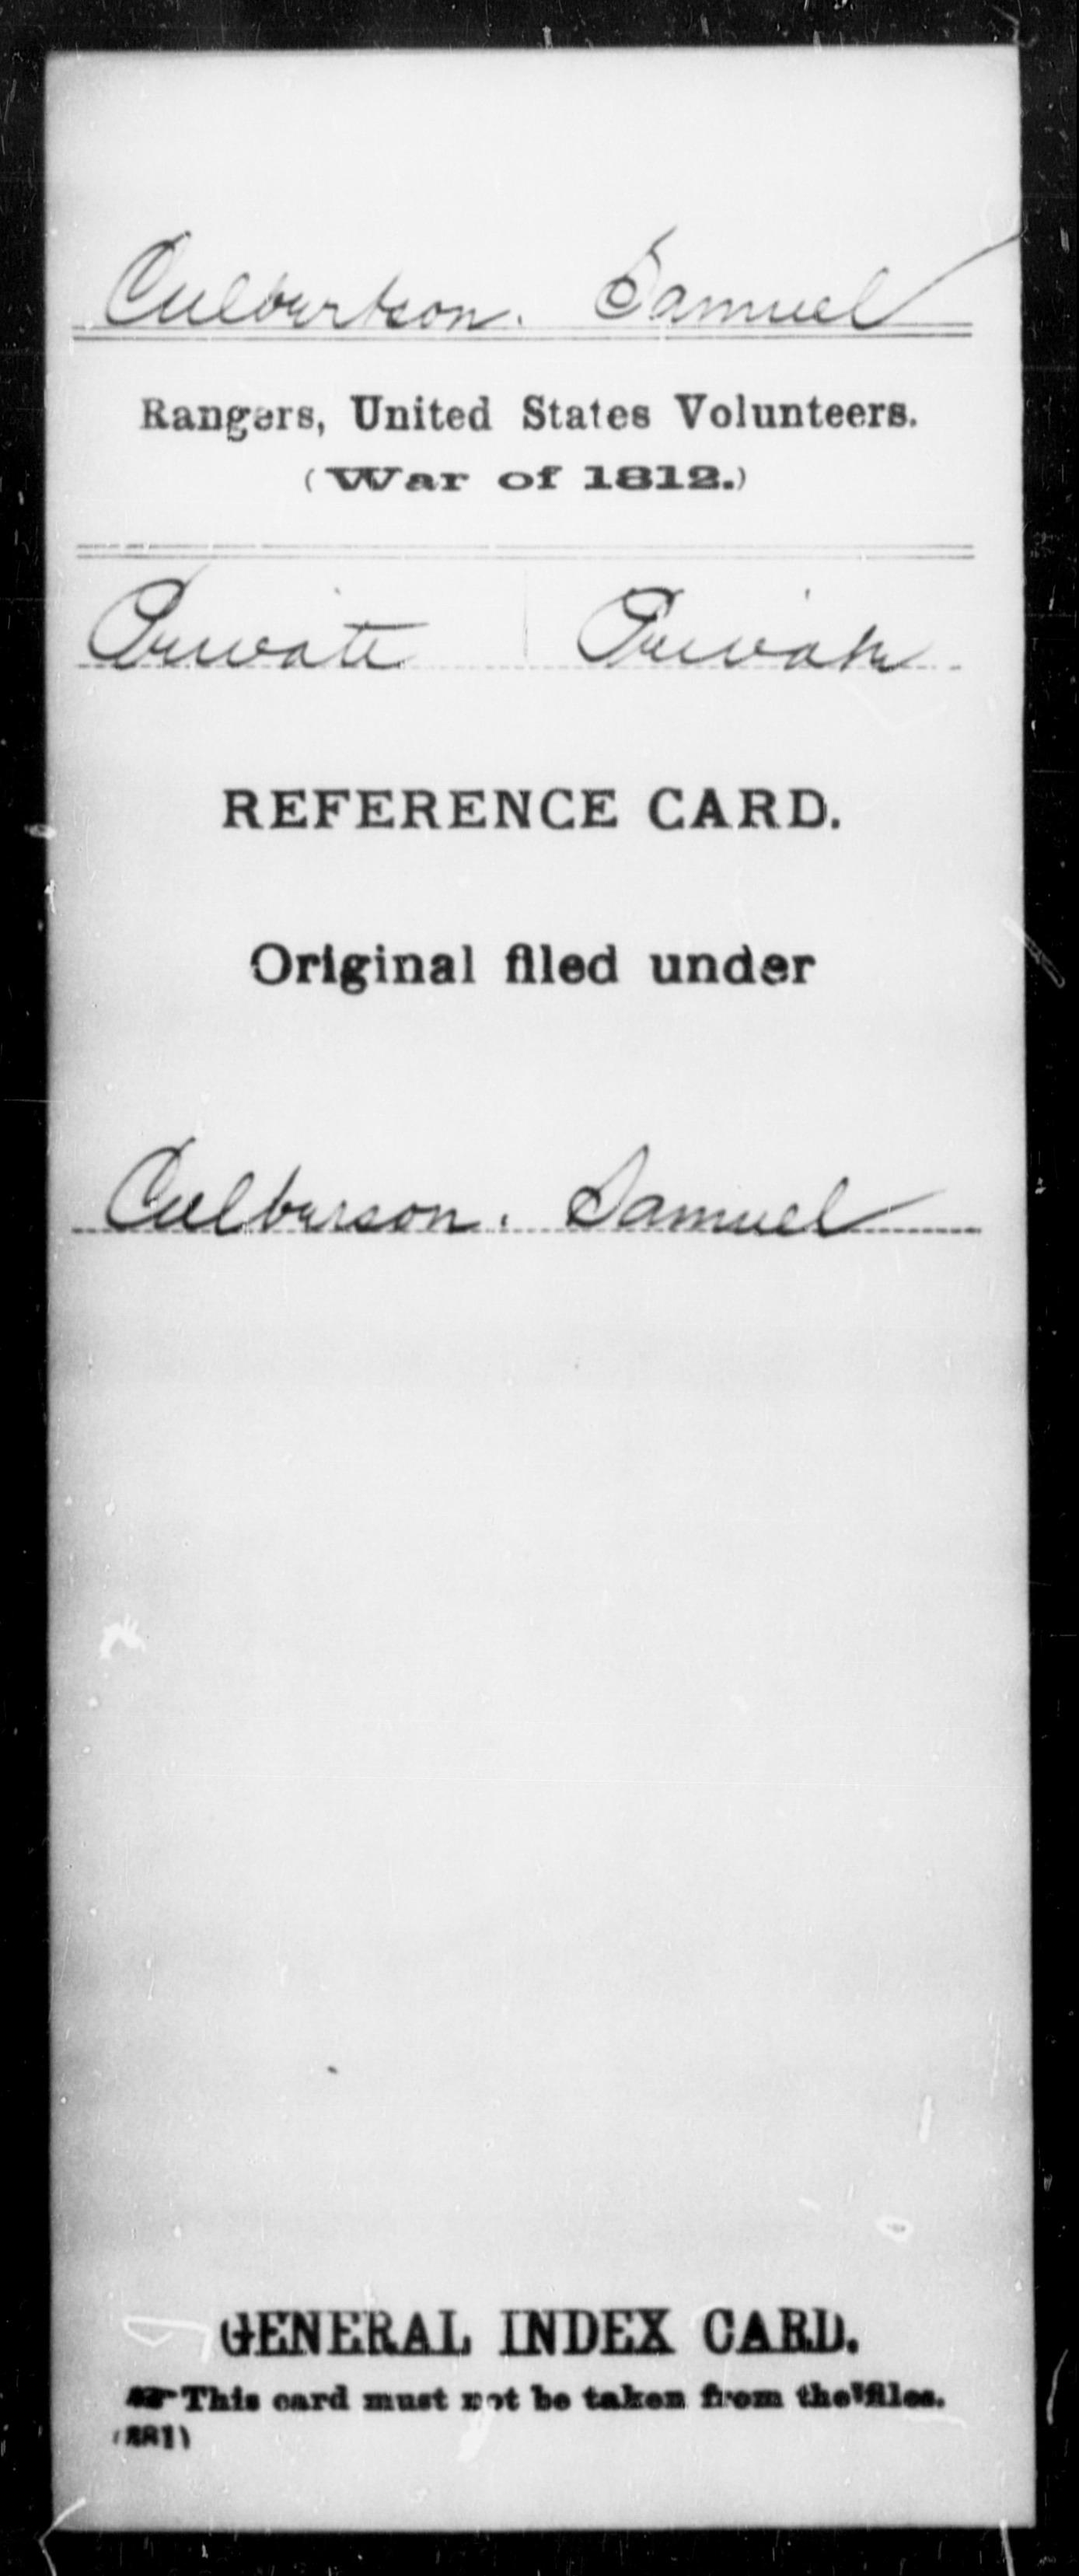 Culbertson, Samuel - State: United States - Regiment: Rangers, United States Volunteers